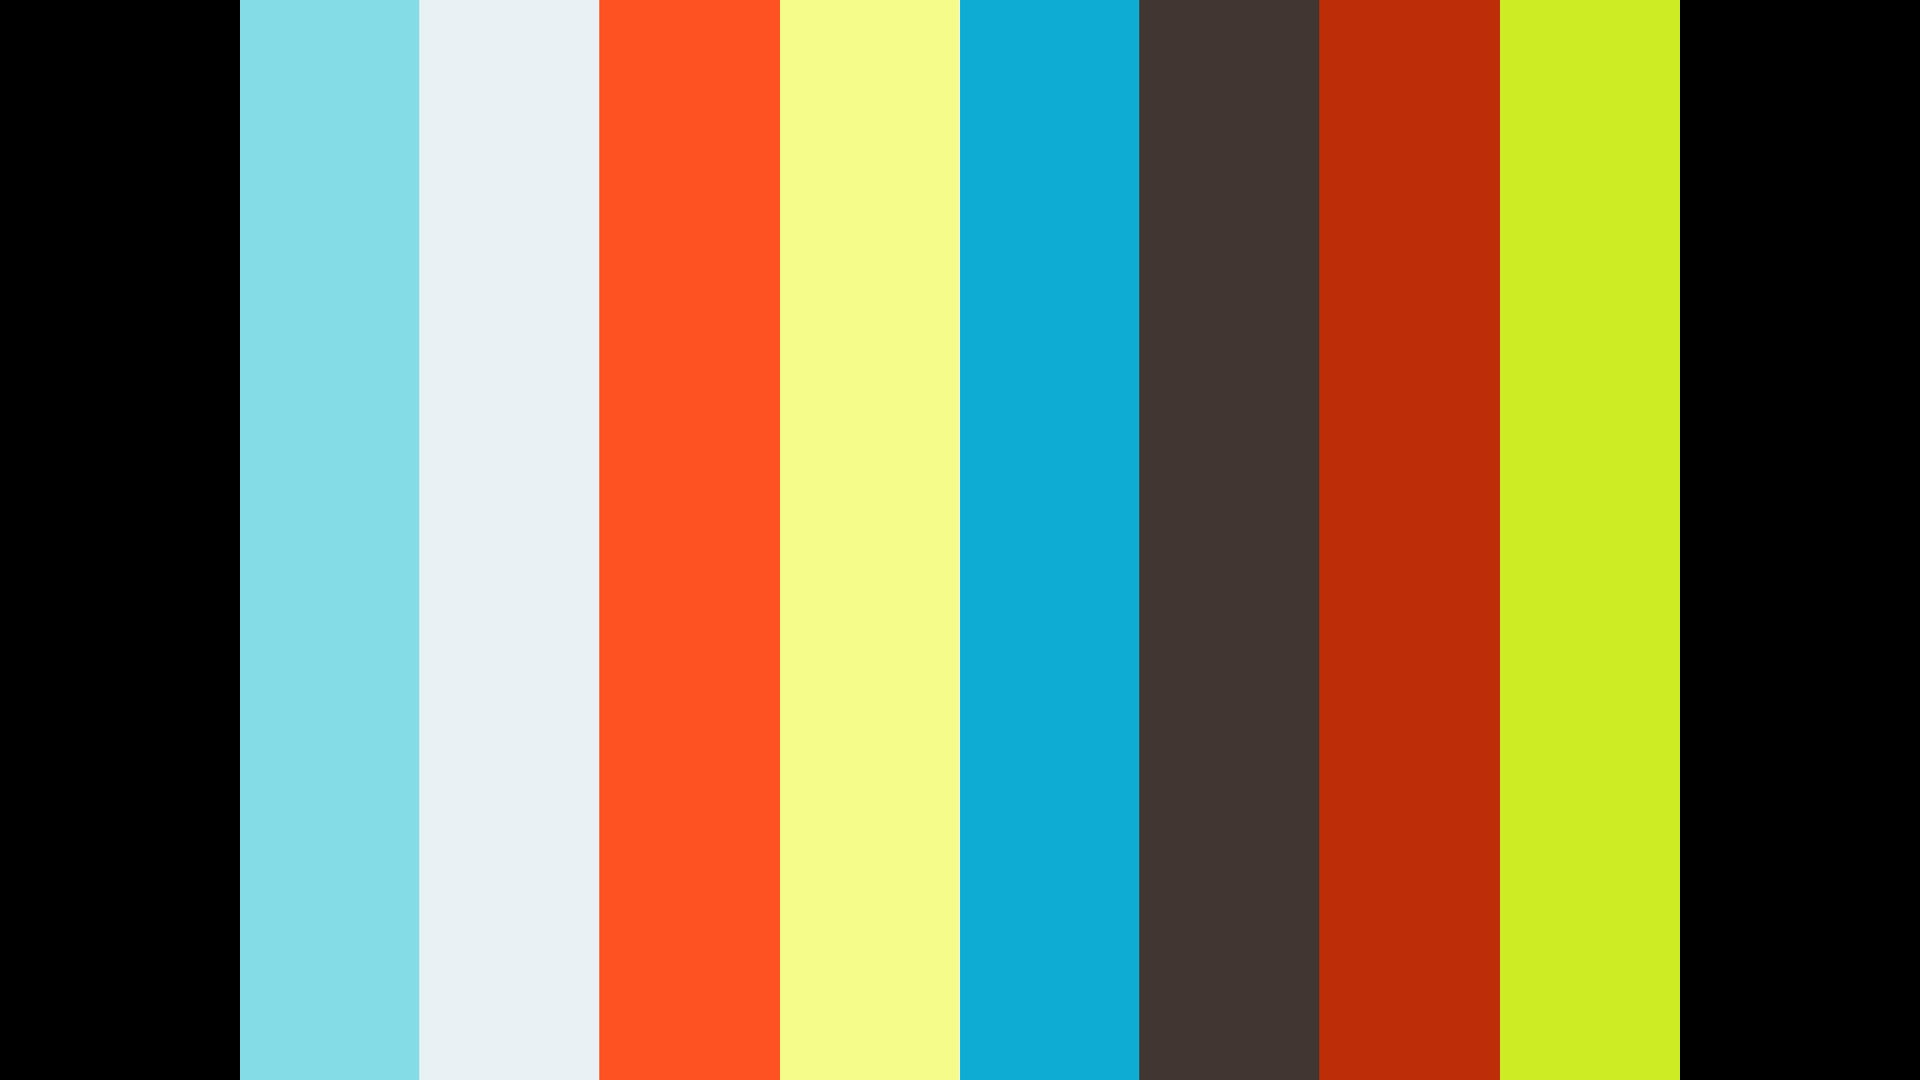 1/19/2020 AM | Vali Simion - Rugaciunea ferventa